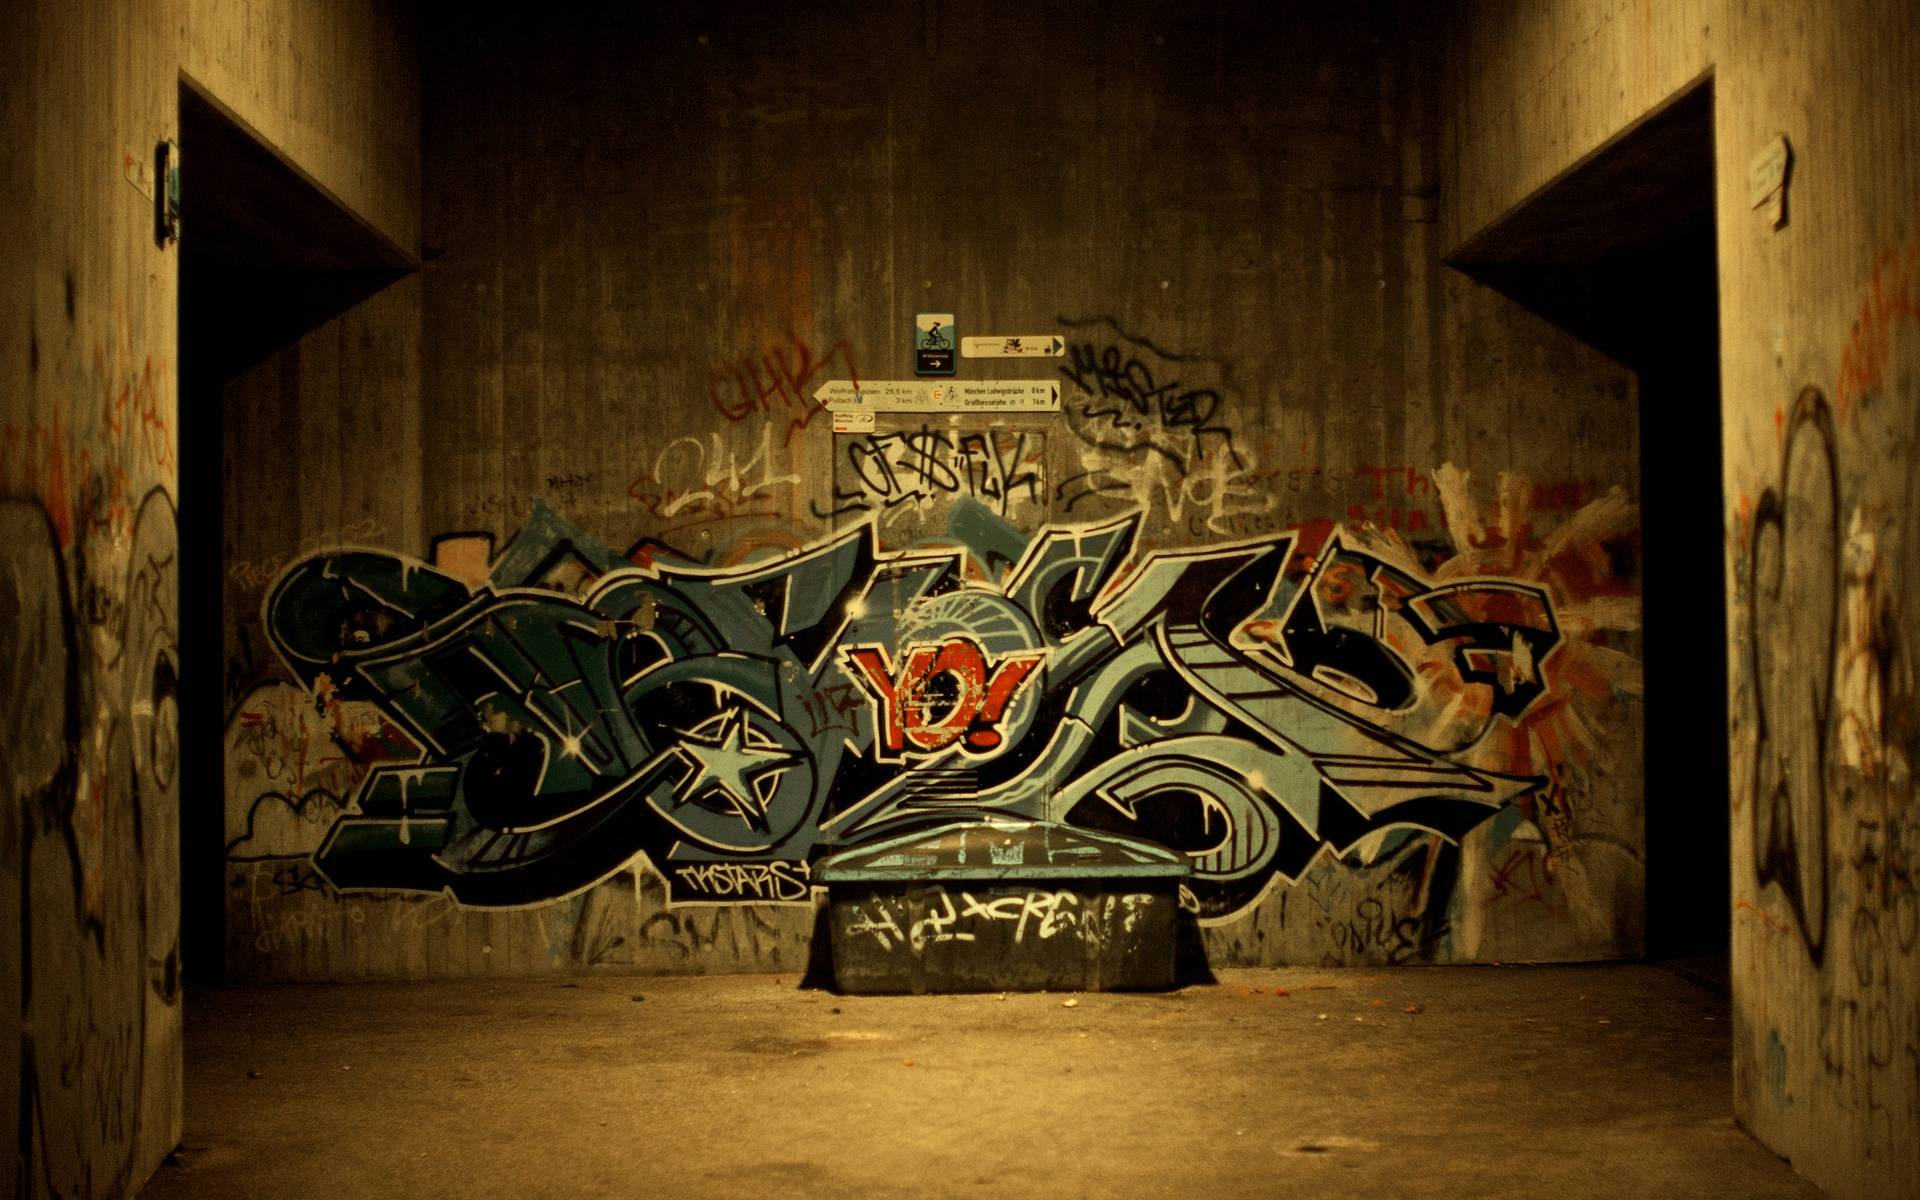 pictures of graffiti art